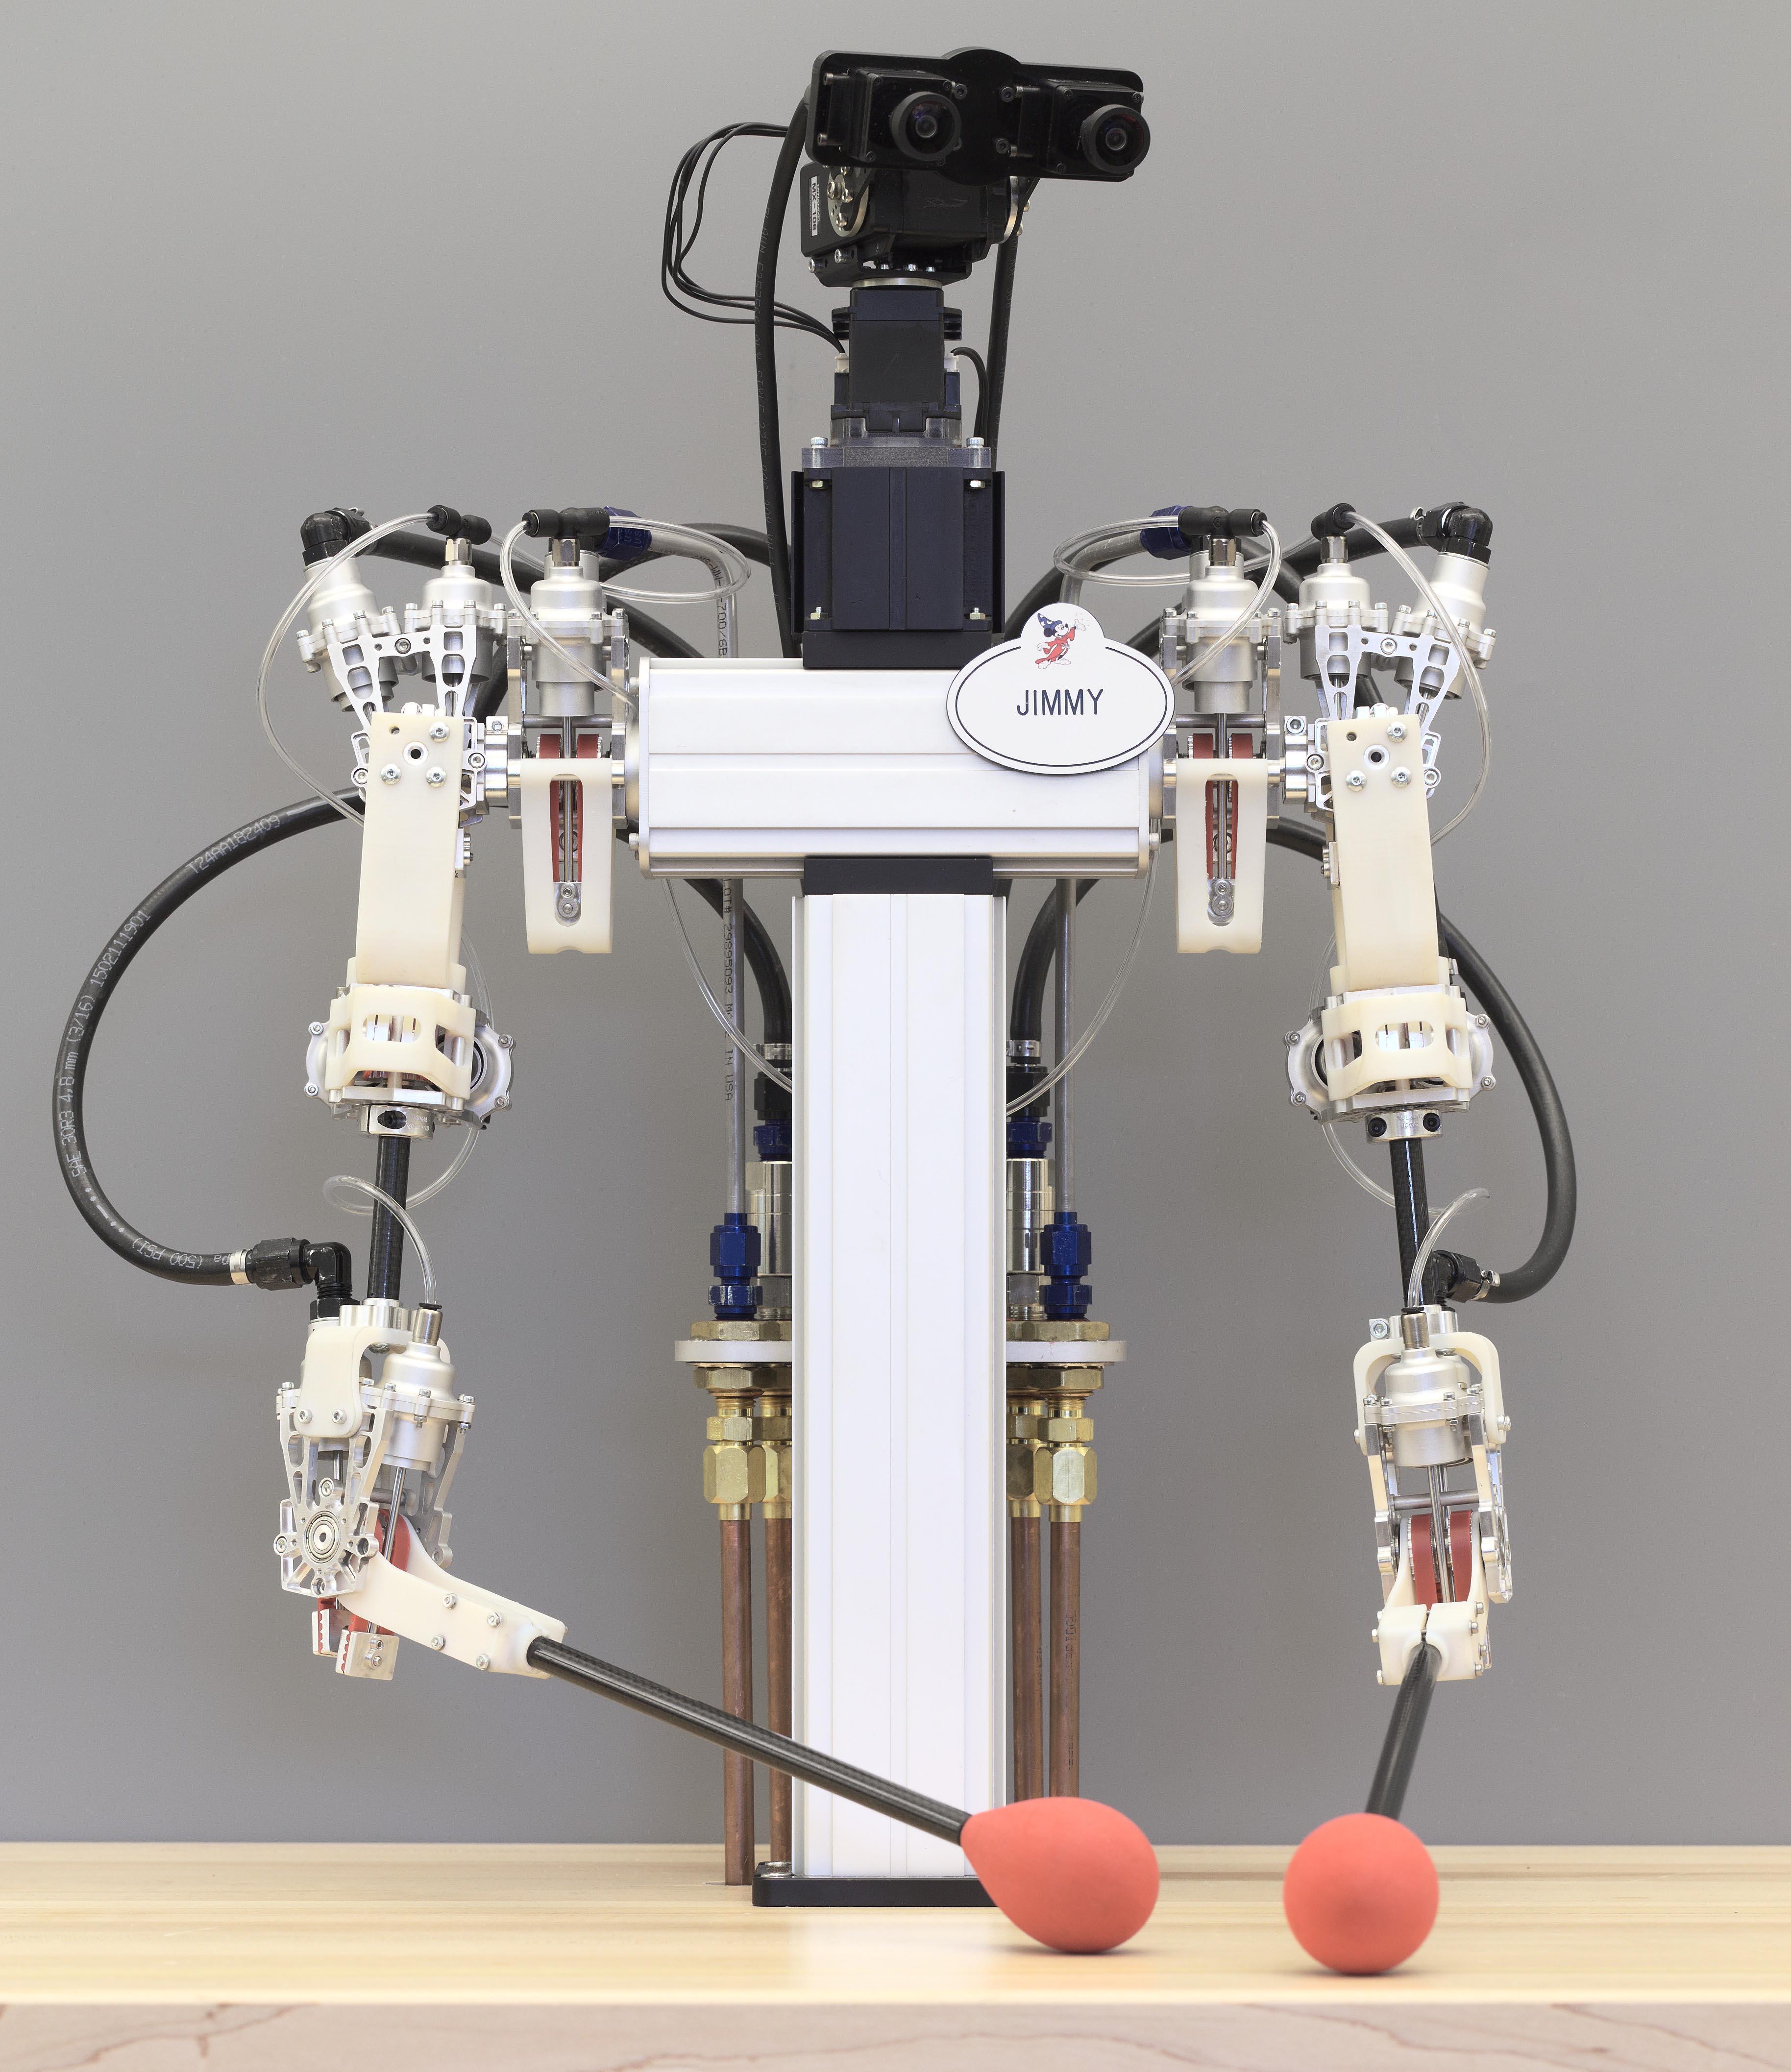 Breakthrough Robot Designs That Tap Fluid Power